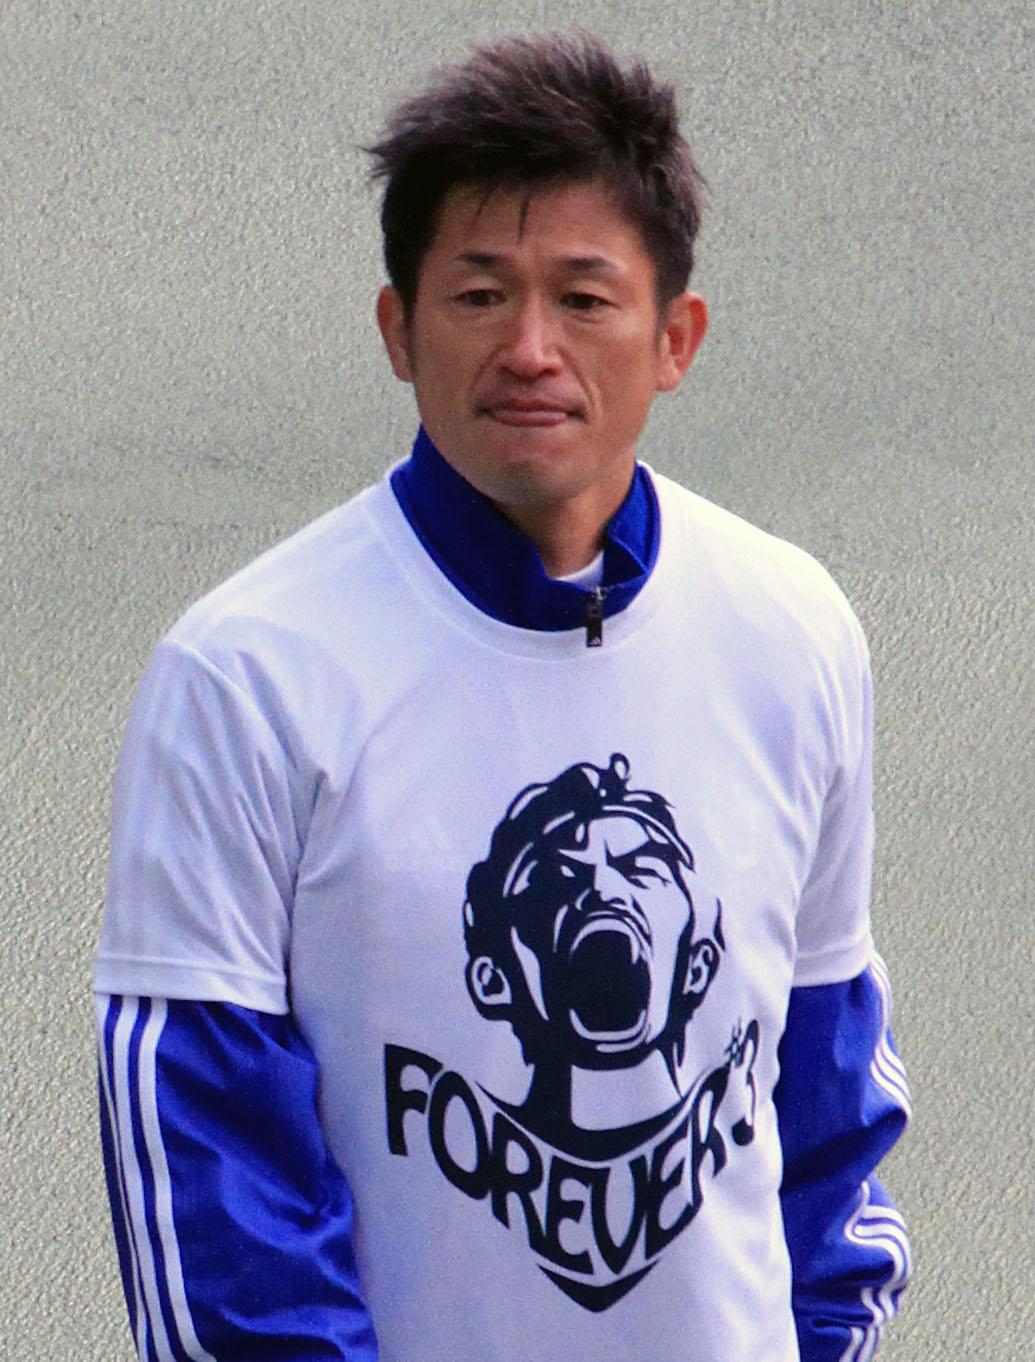 kazuyoshi miura - photo #9